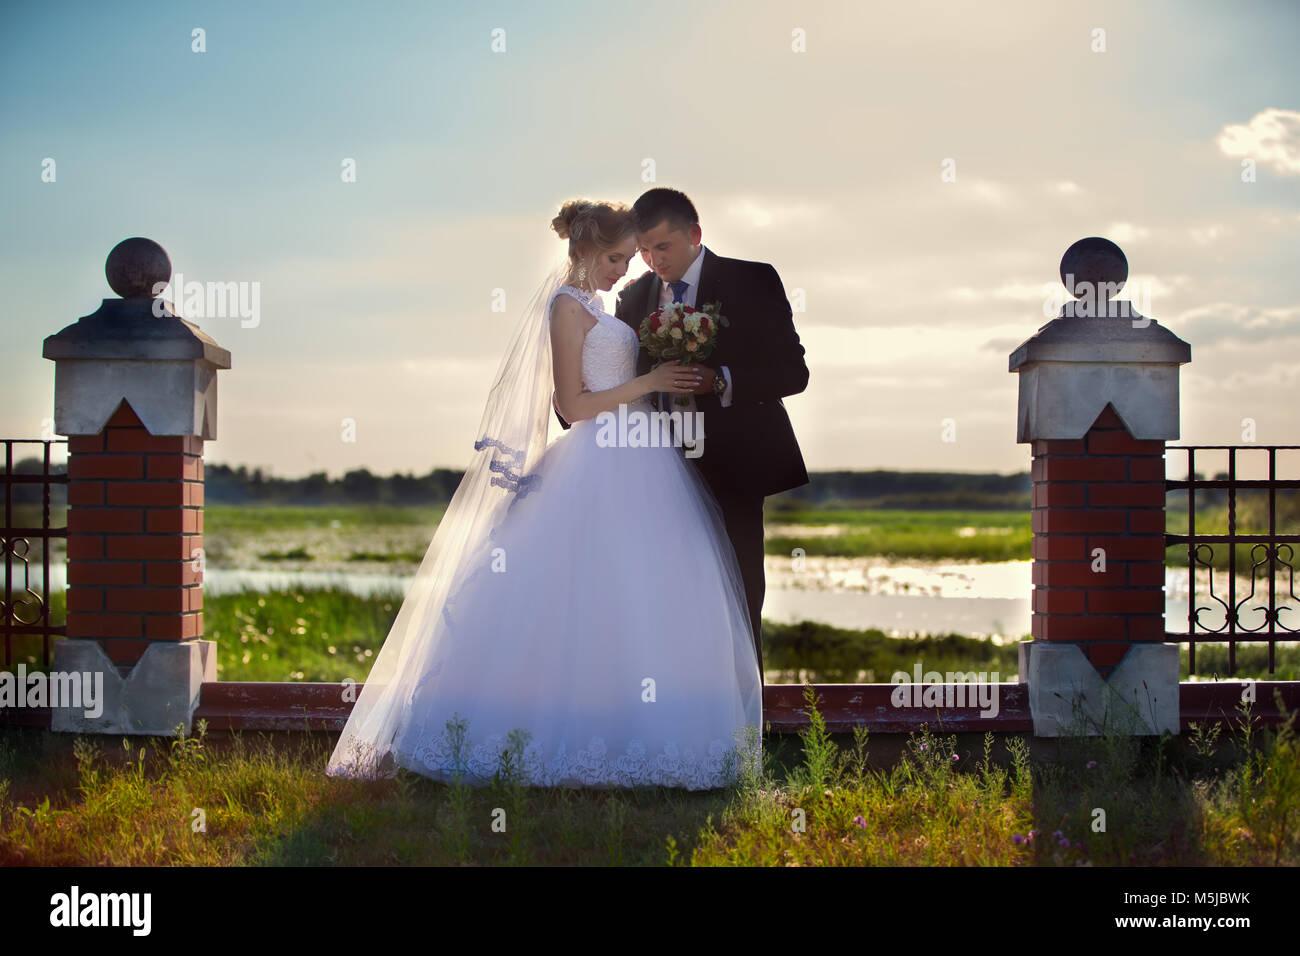 Belarus, Brest region, Motol village, August 05, 2017. Wedding park.Bride and groom on a wedding walk - Stock Image